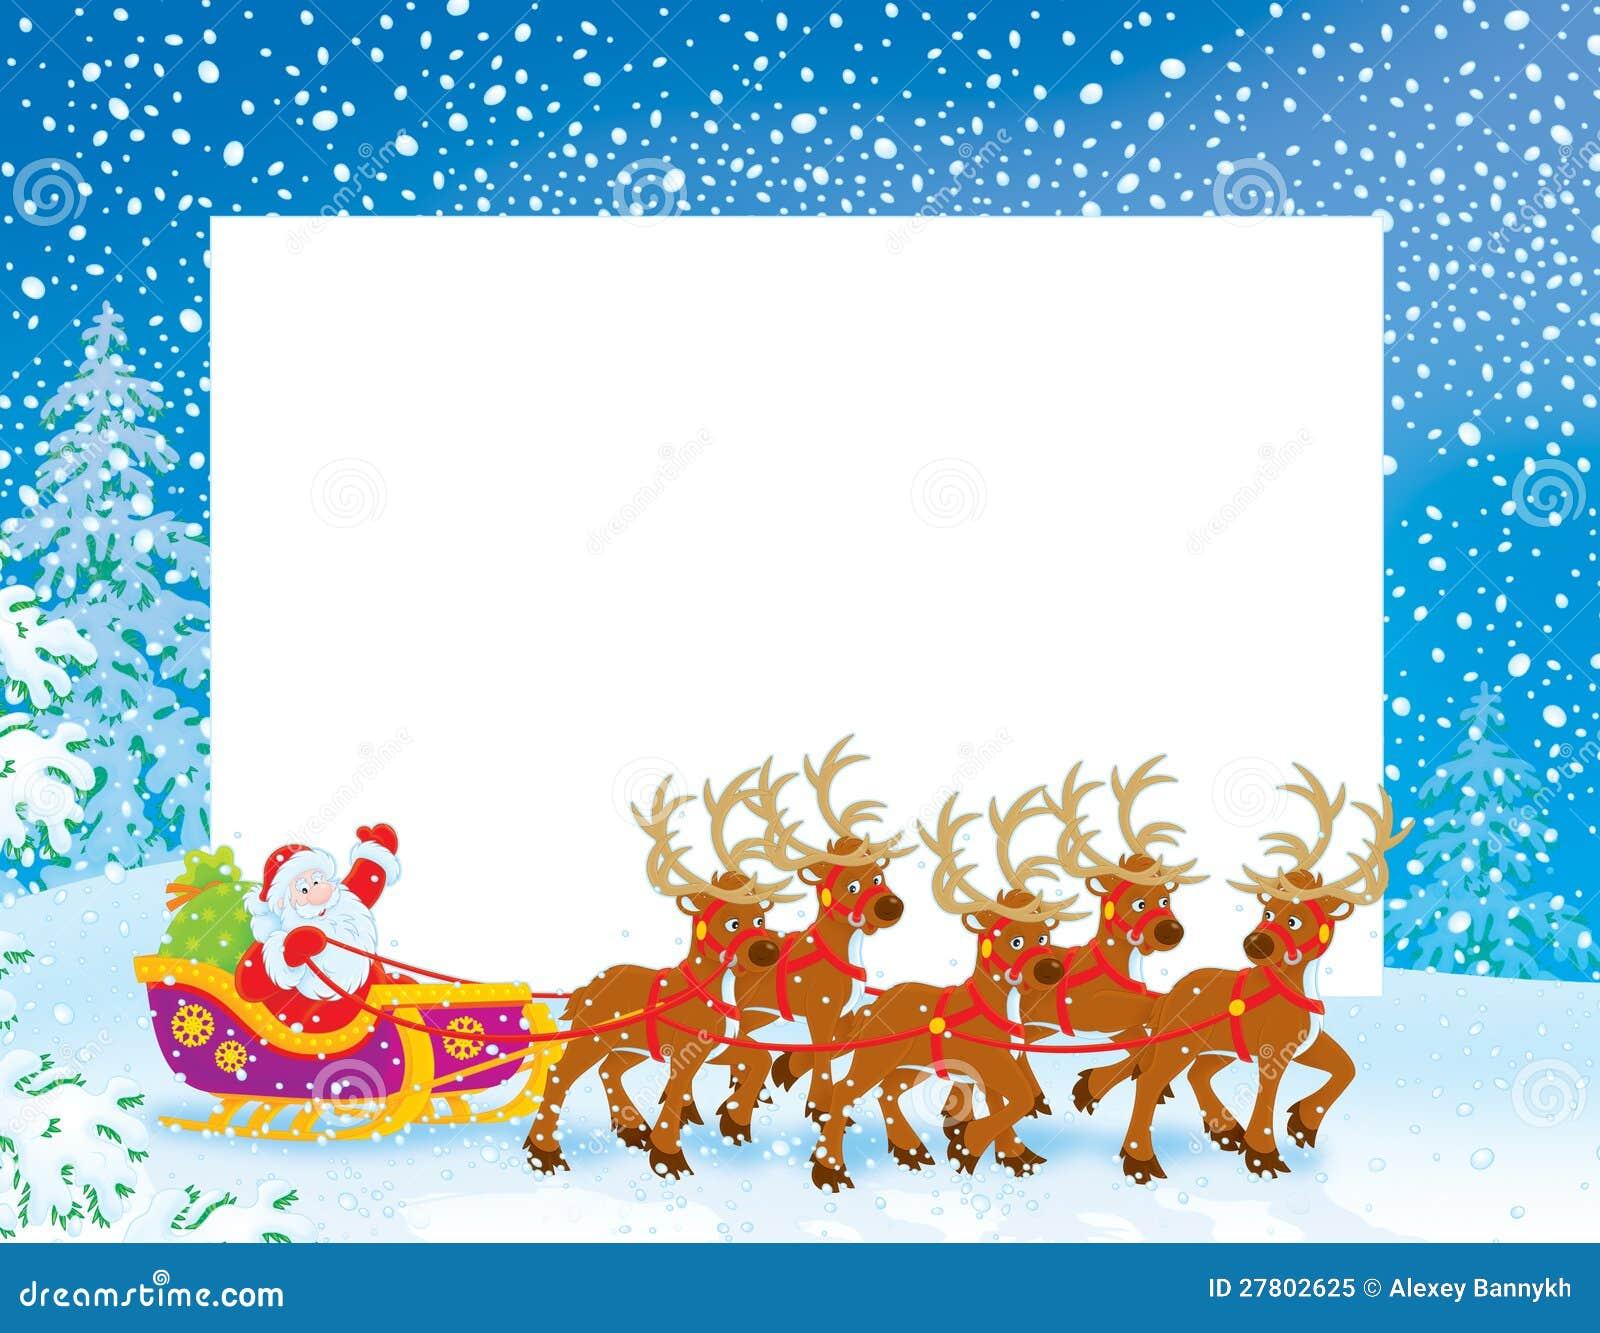 border with sleigh of santa claus stock illustration